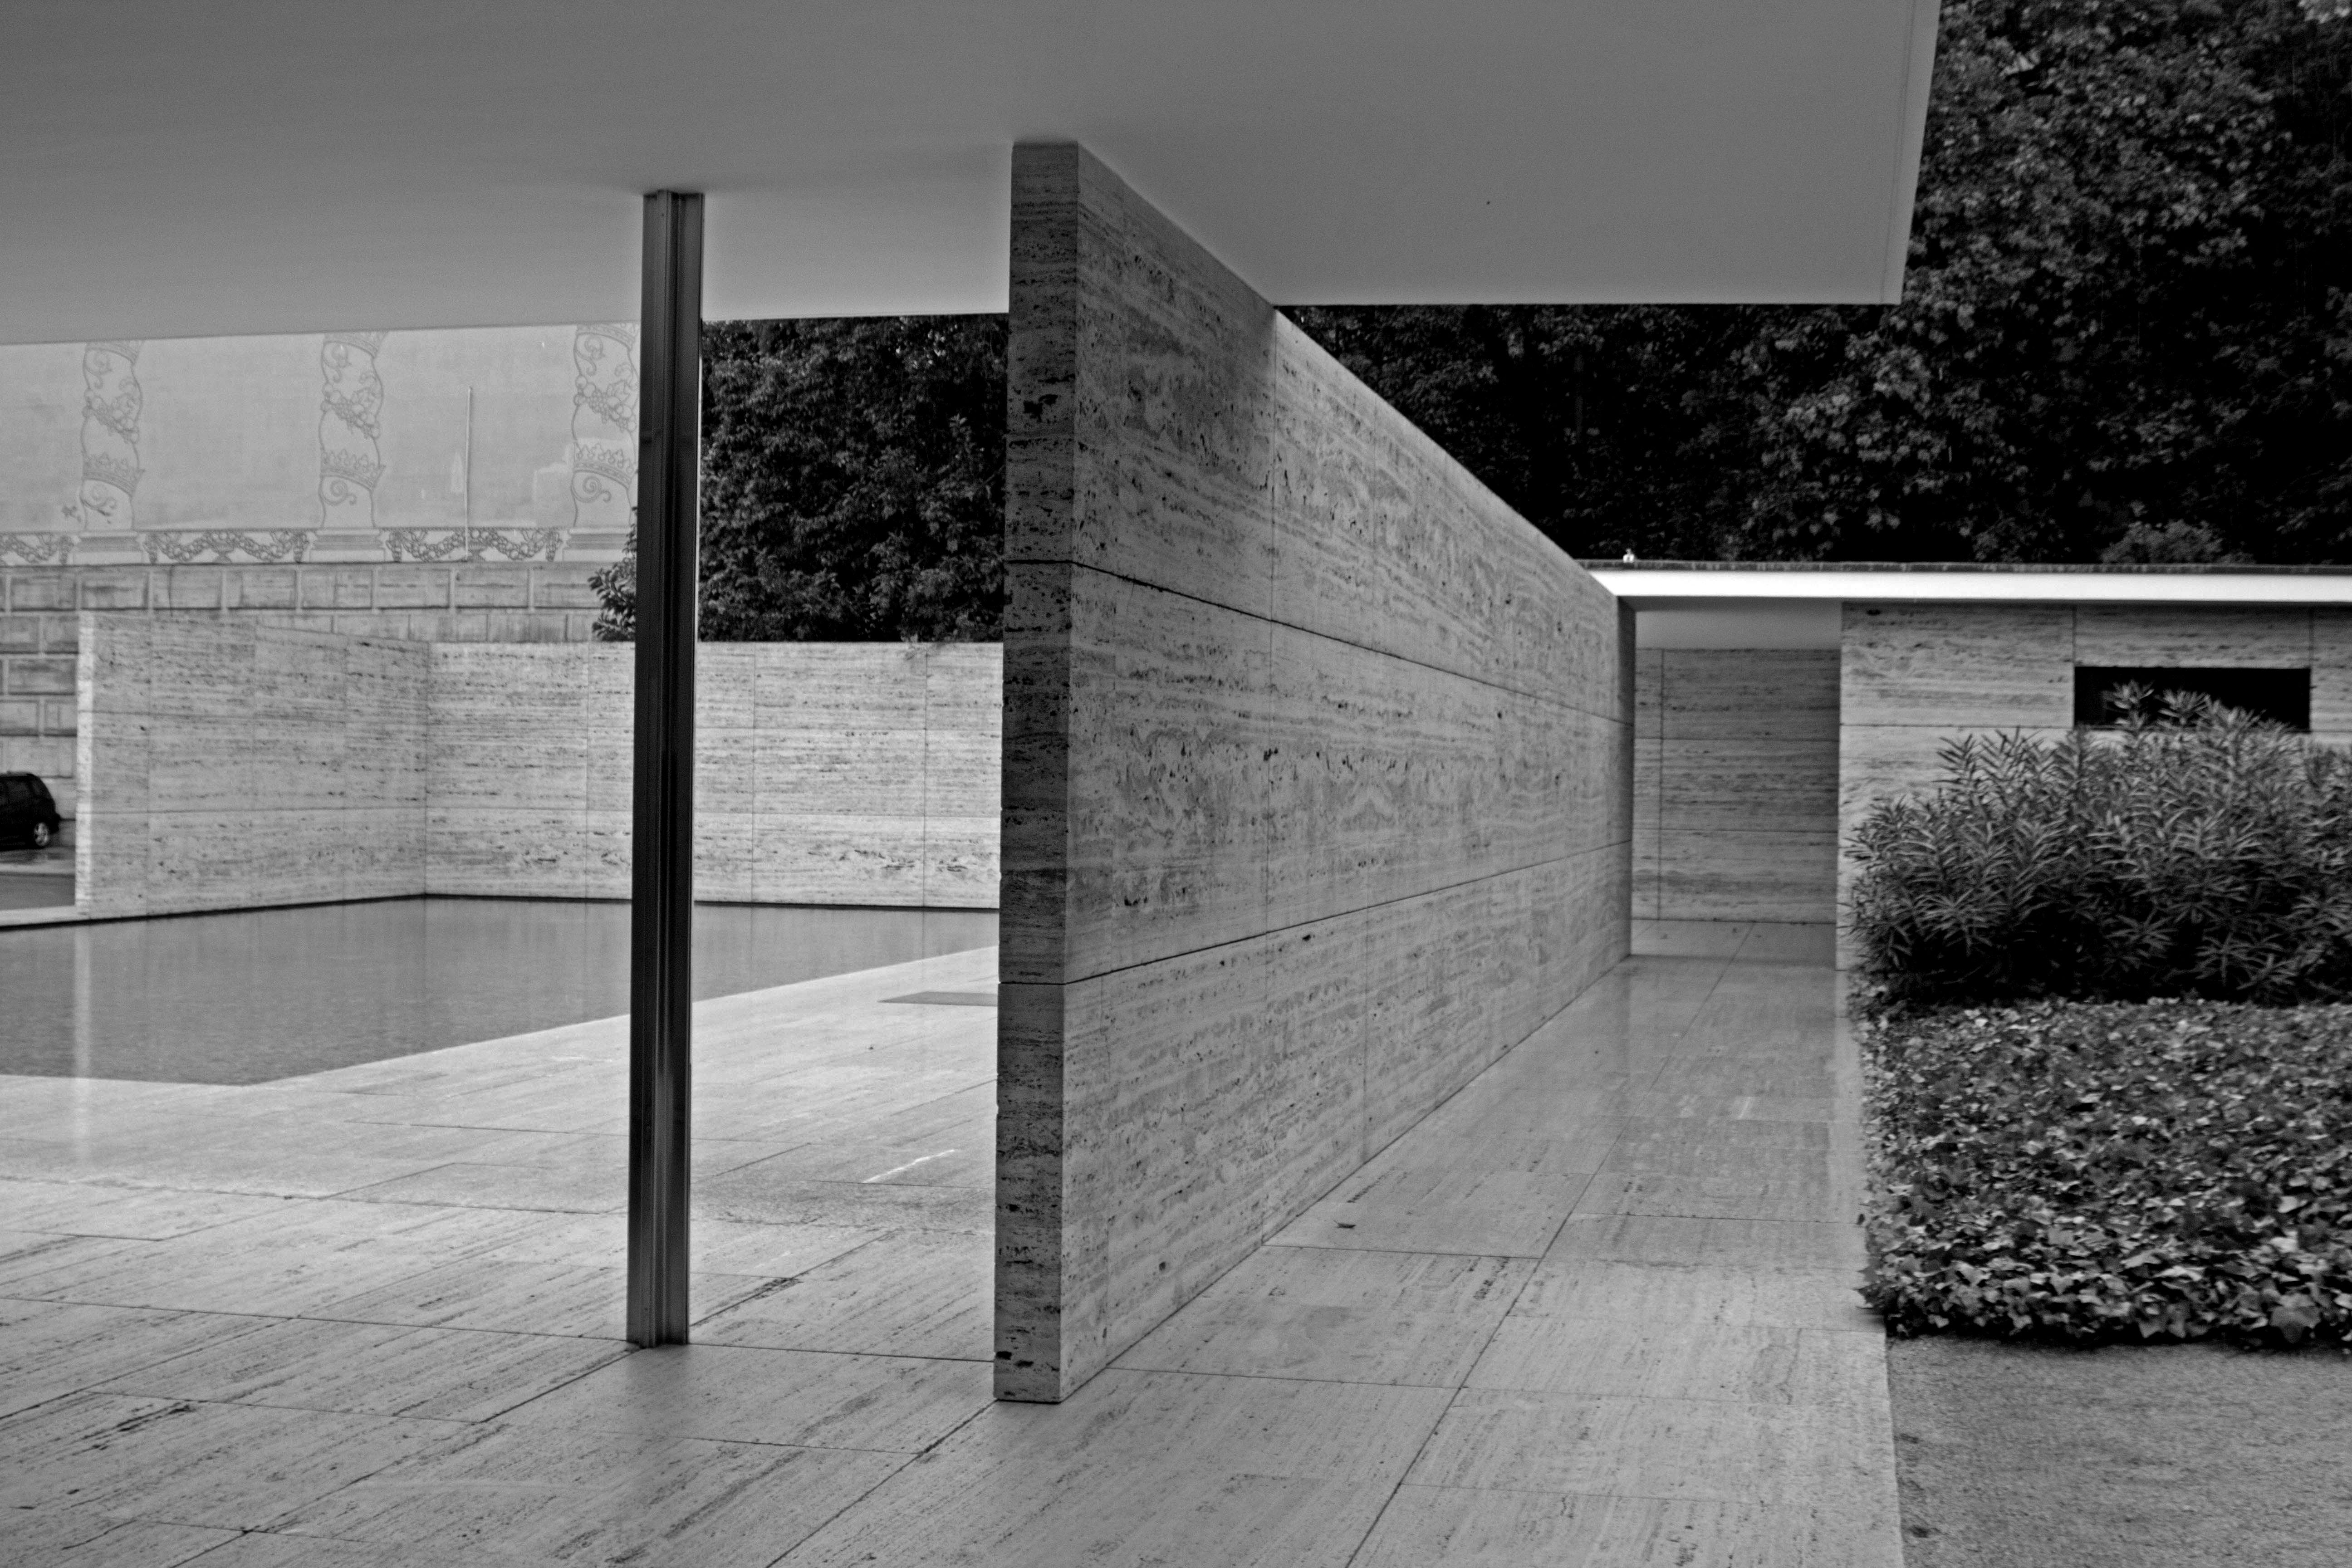 María Jesús Mora_ Arquitecto_ Fotógrafo_Alicante_ Pabellón de Mies en Barcelona 17